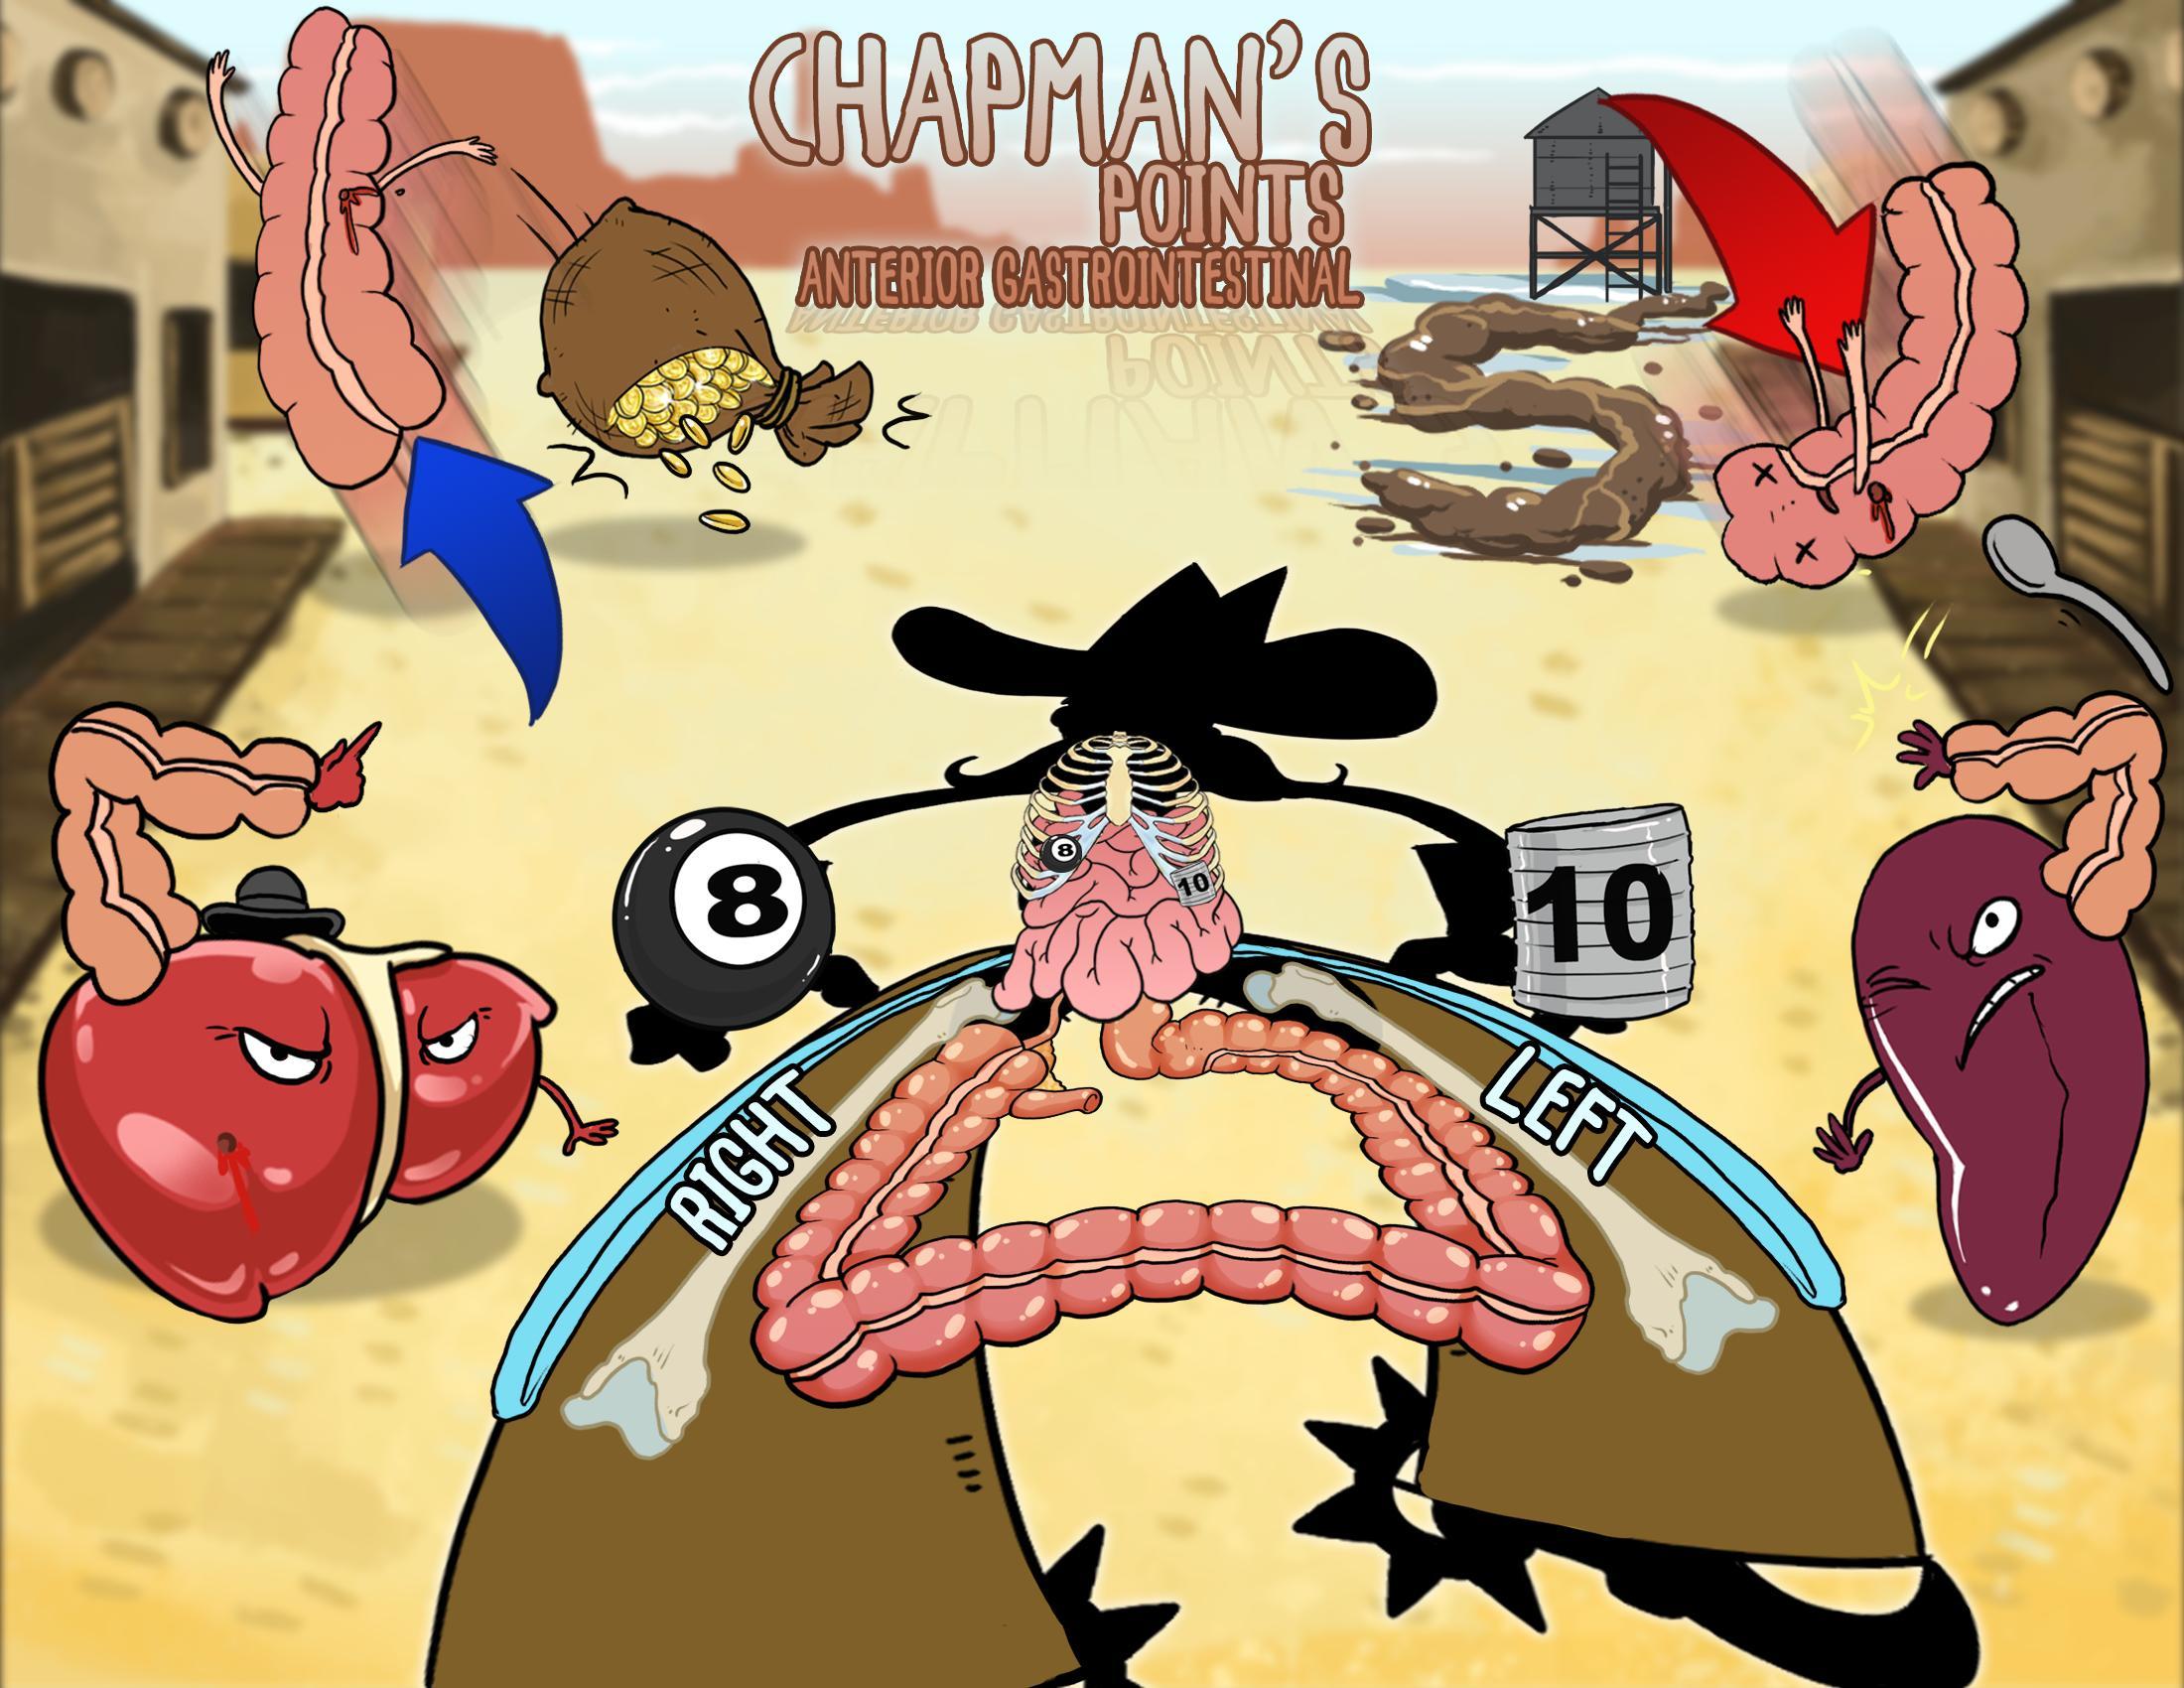 Chapman's Points - Anterior Gastrointestinal